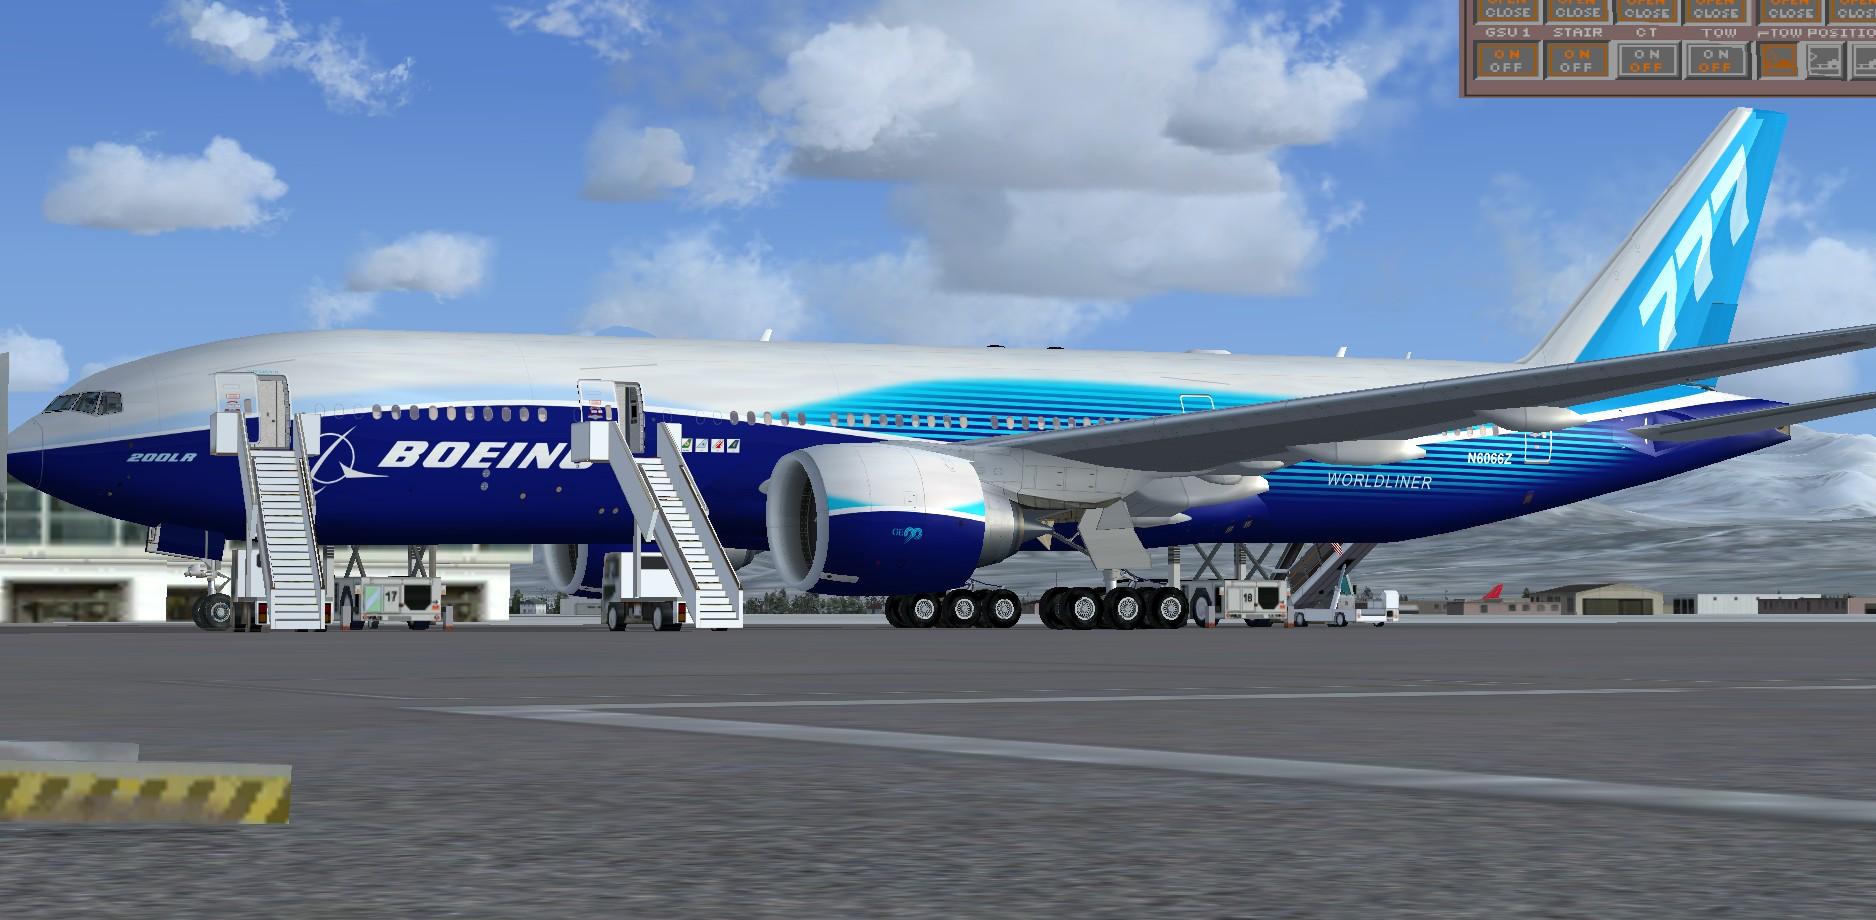 fs-freeware net - FSX Boeing 777-200LR Worldliner Livery